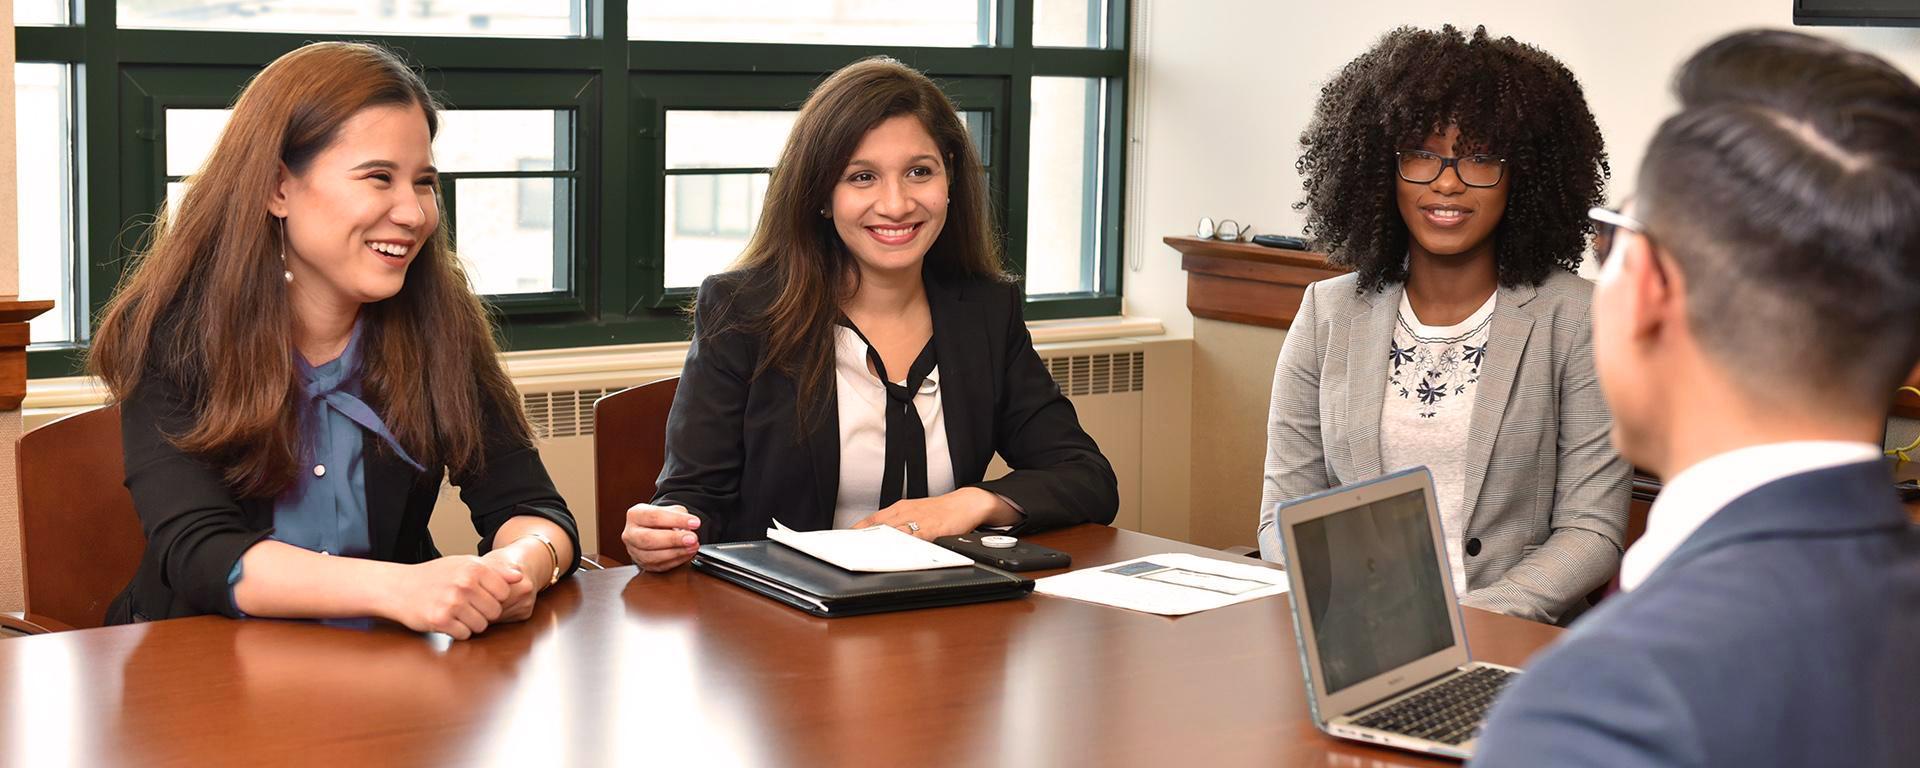 SUNY Online MBA